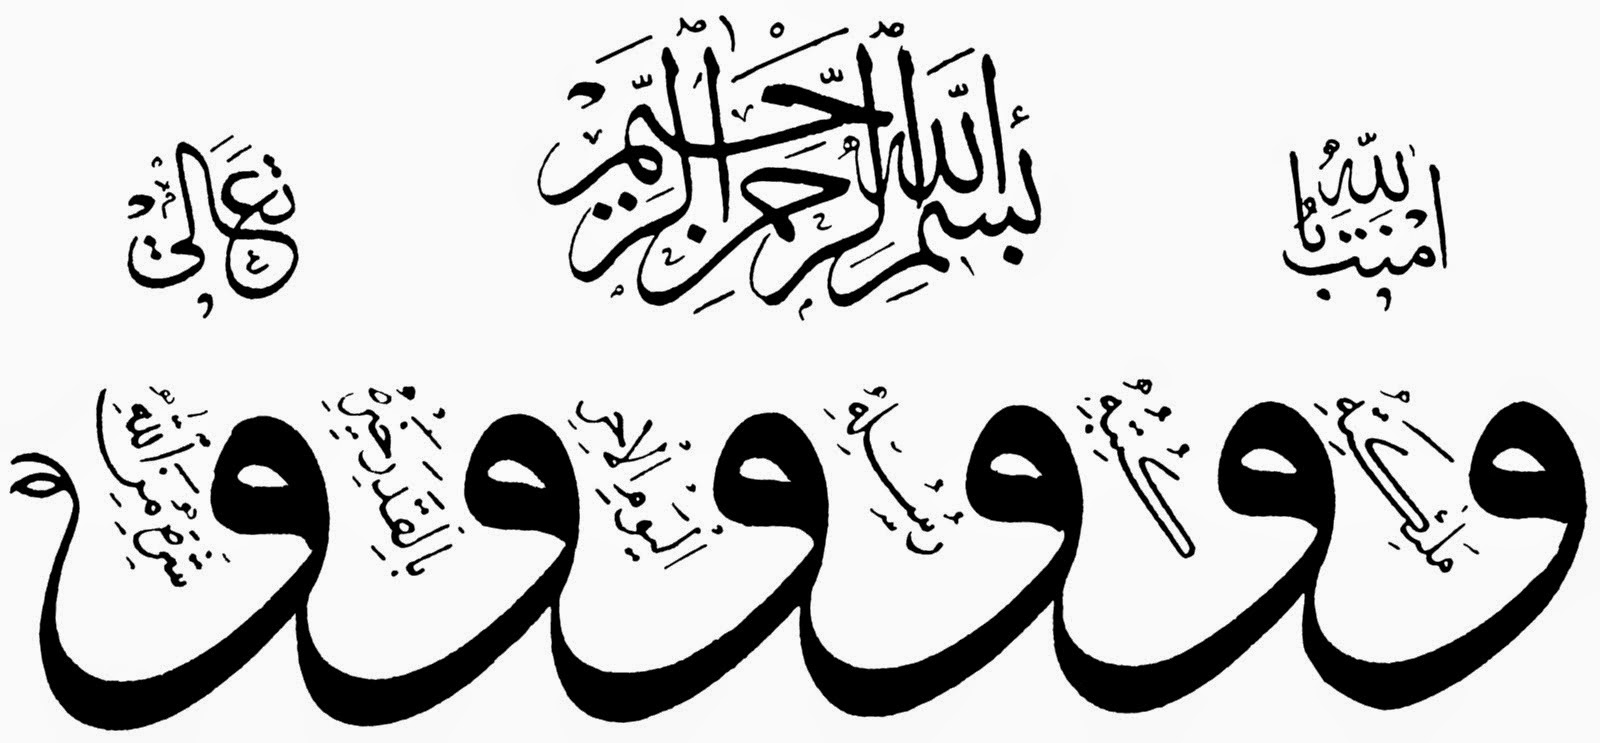 Calligraphy-Auraad e Mashaa'ikh